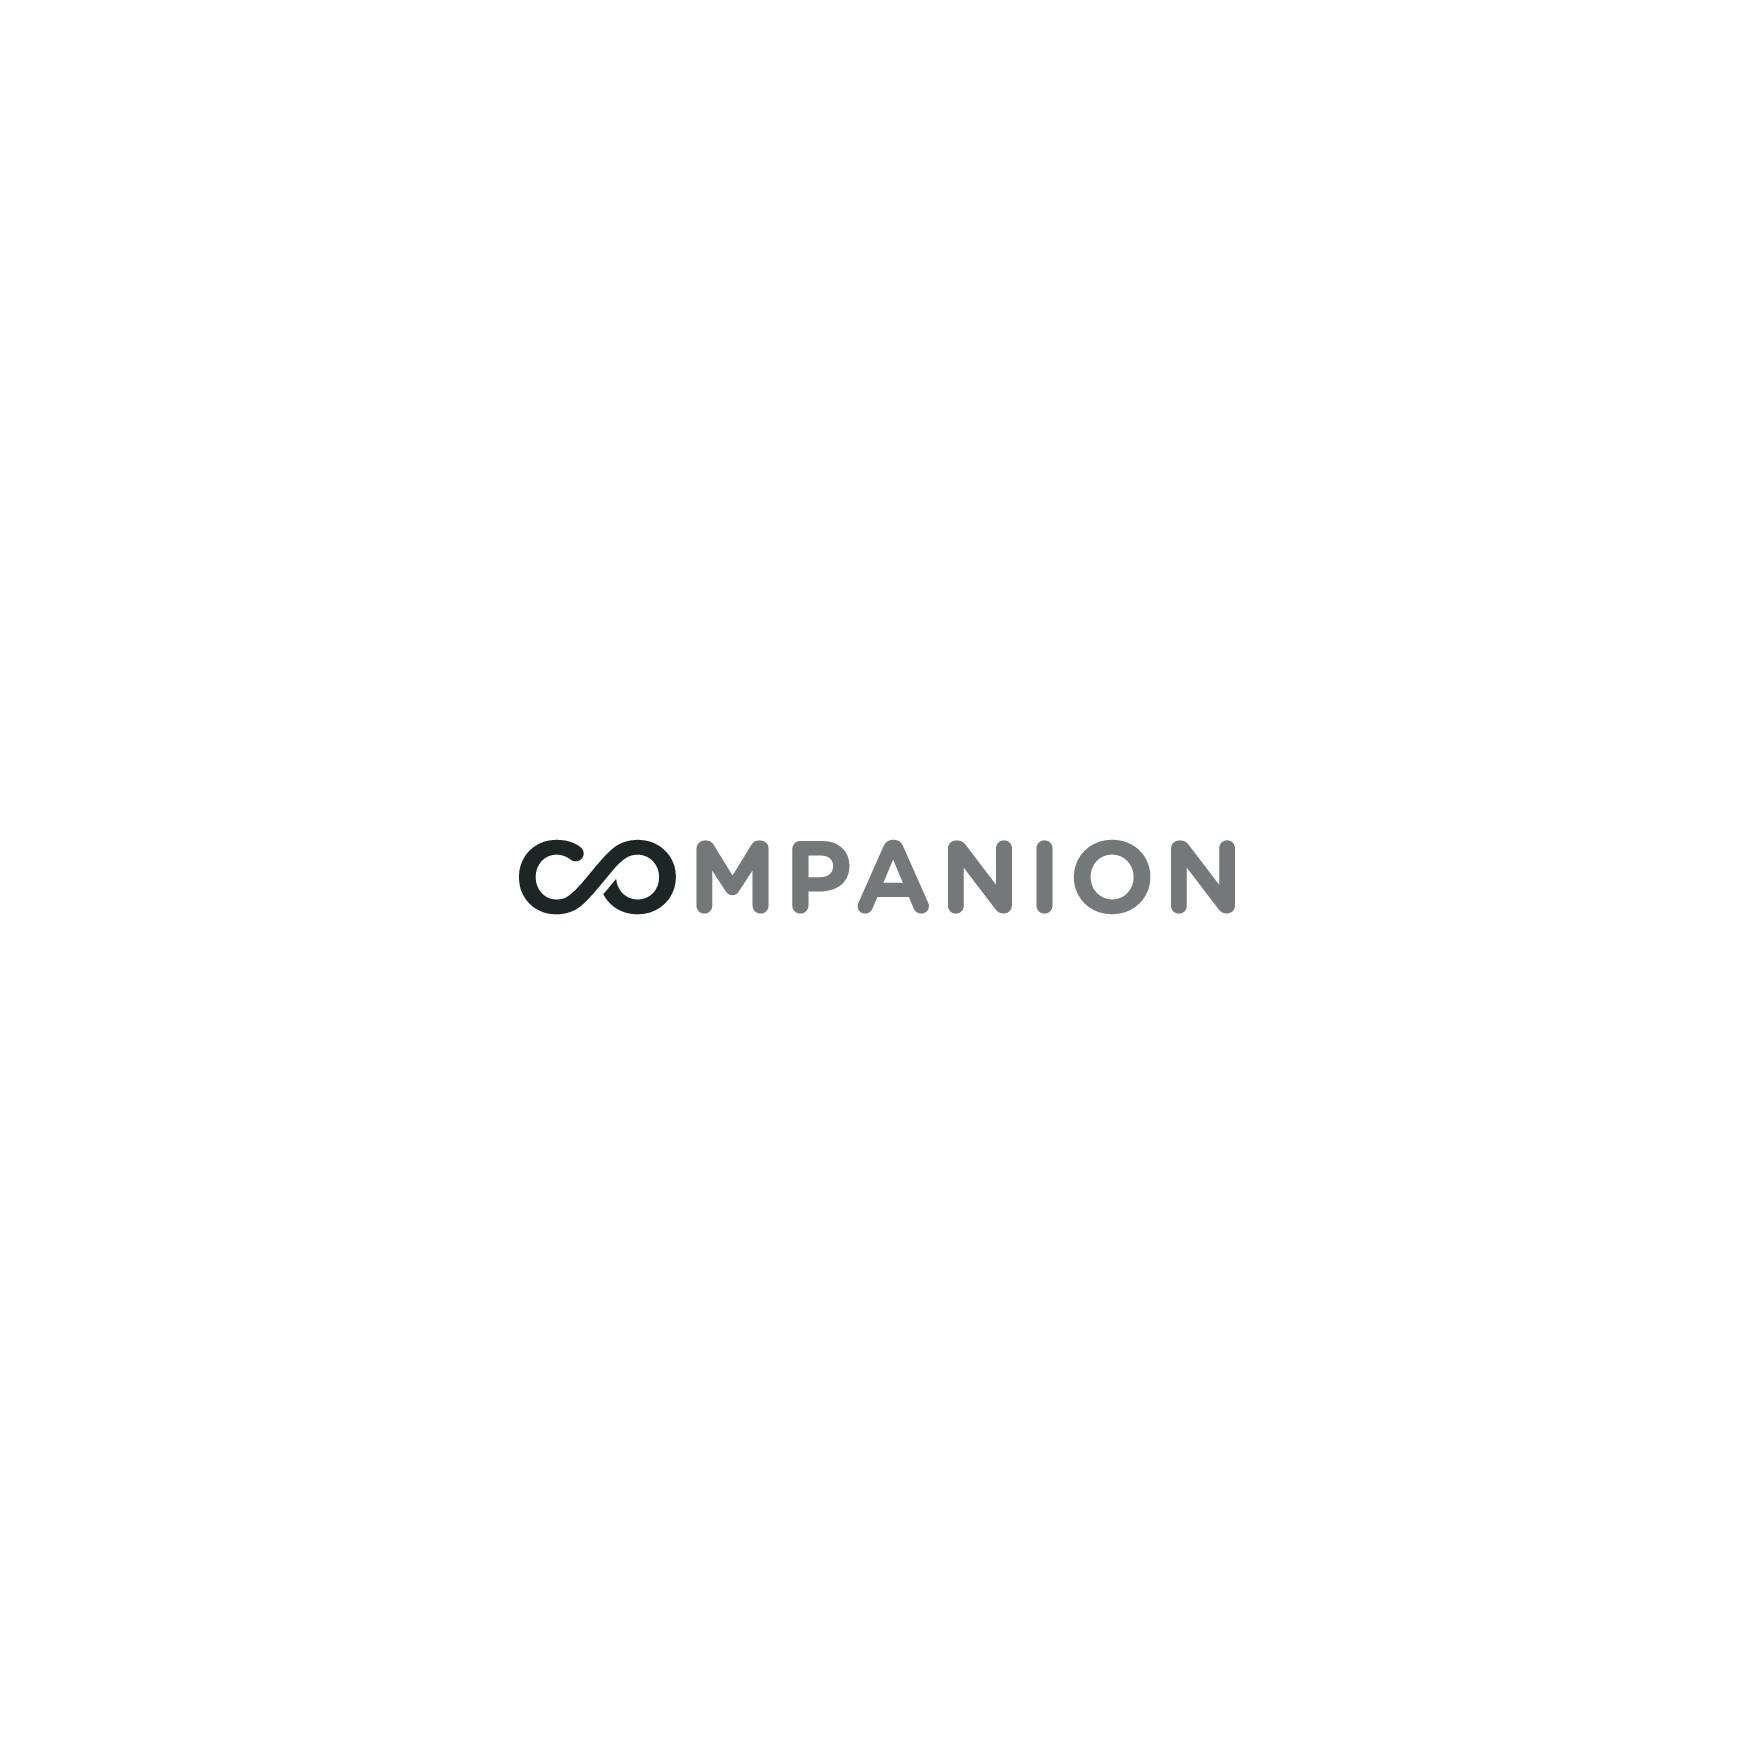 Companion - the Newest Ad Technology Logo Design!